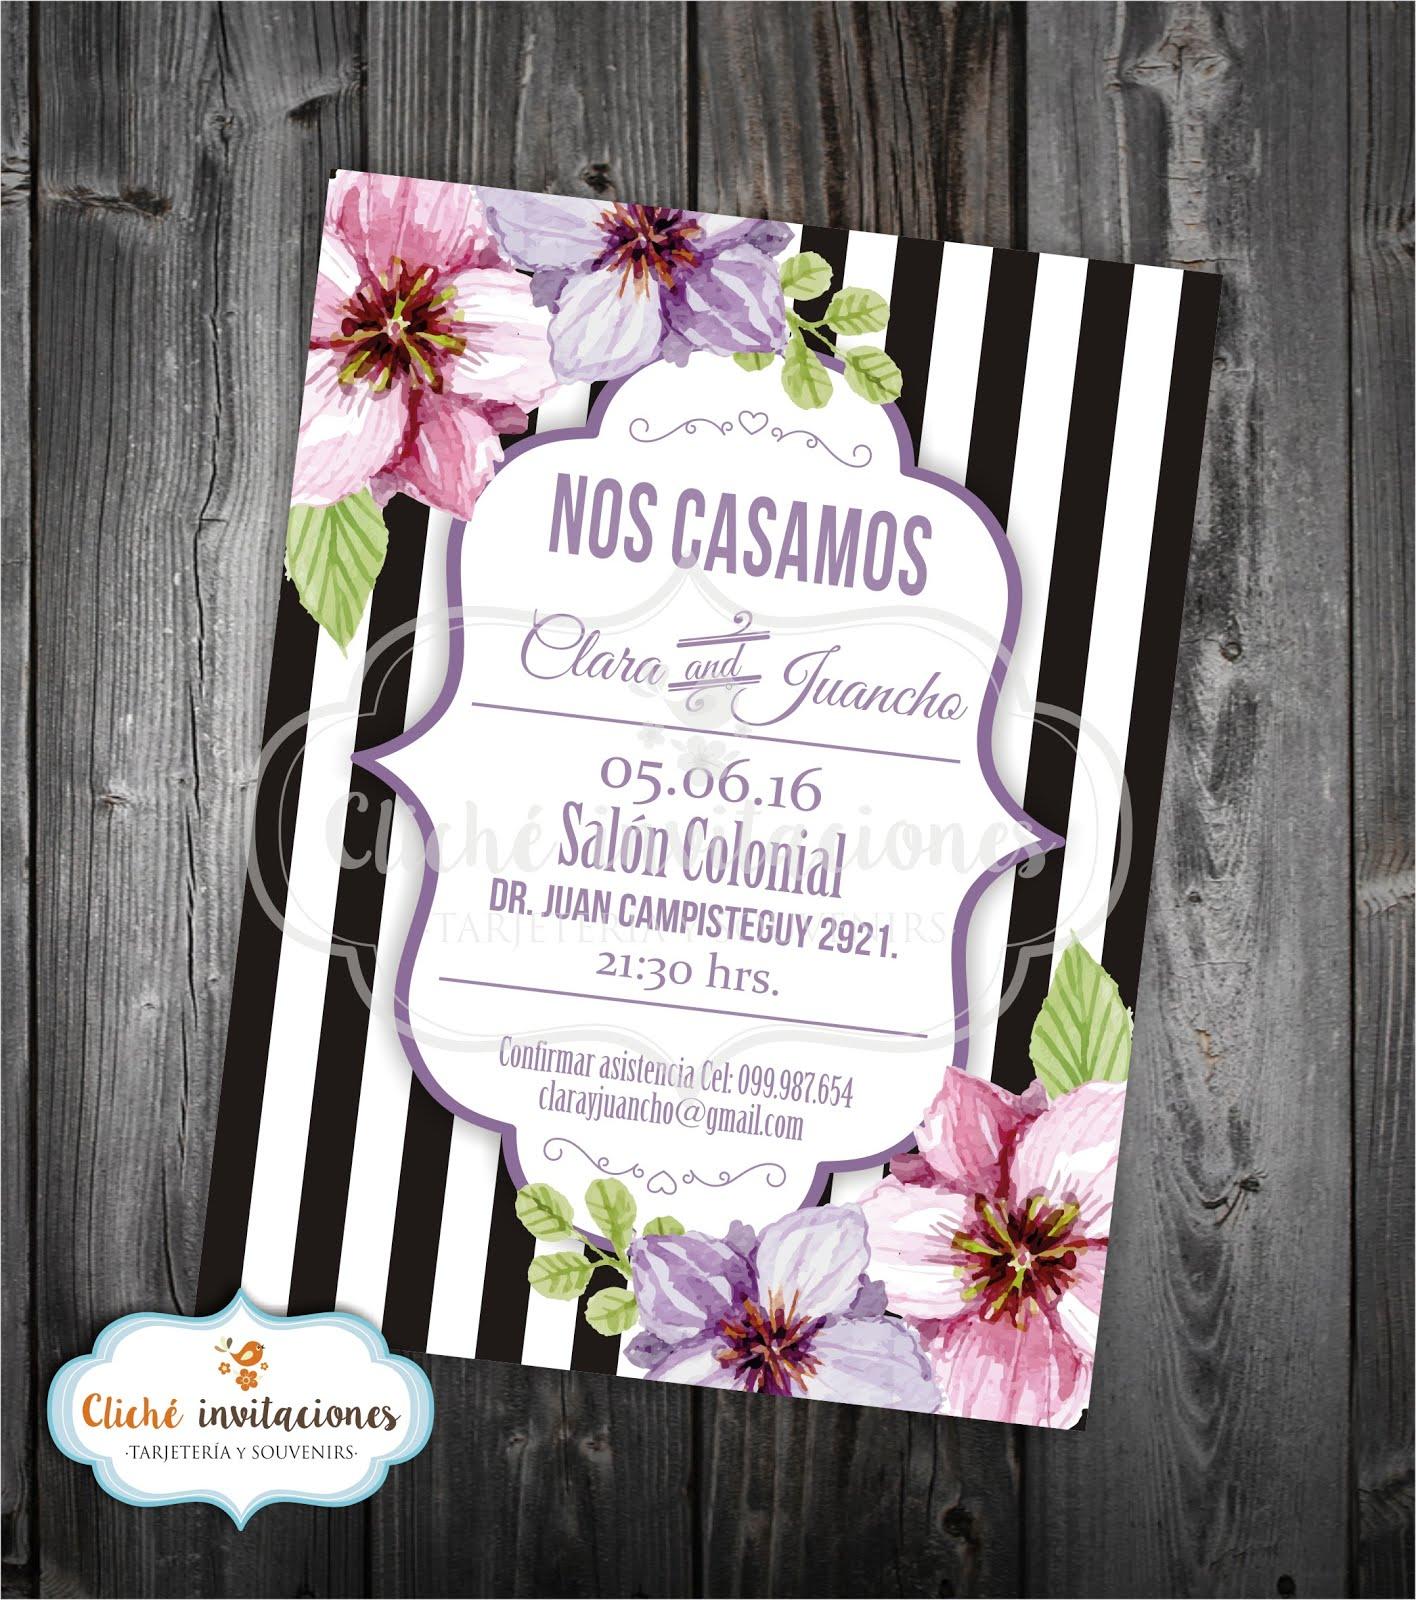 Cliche invitaciones tarjetas de cumplea os invitaciones - Disenos tarjetas de boda ...